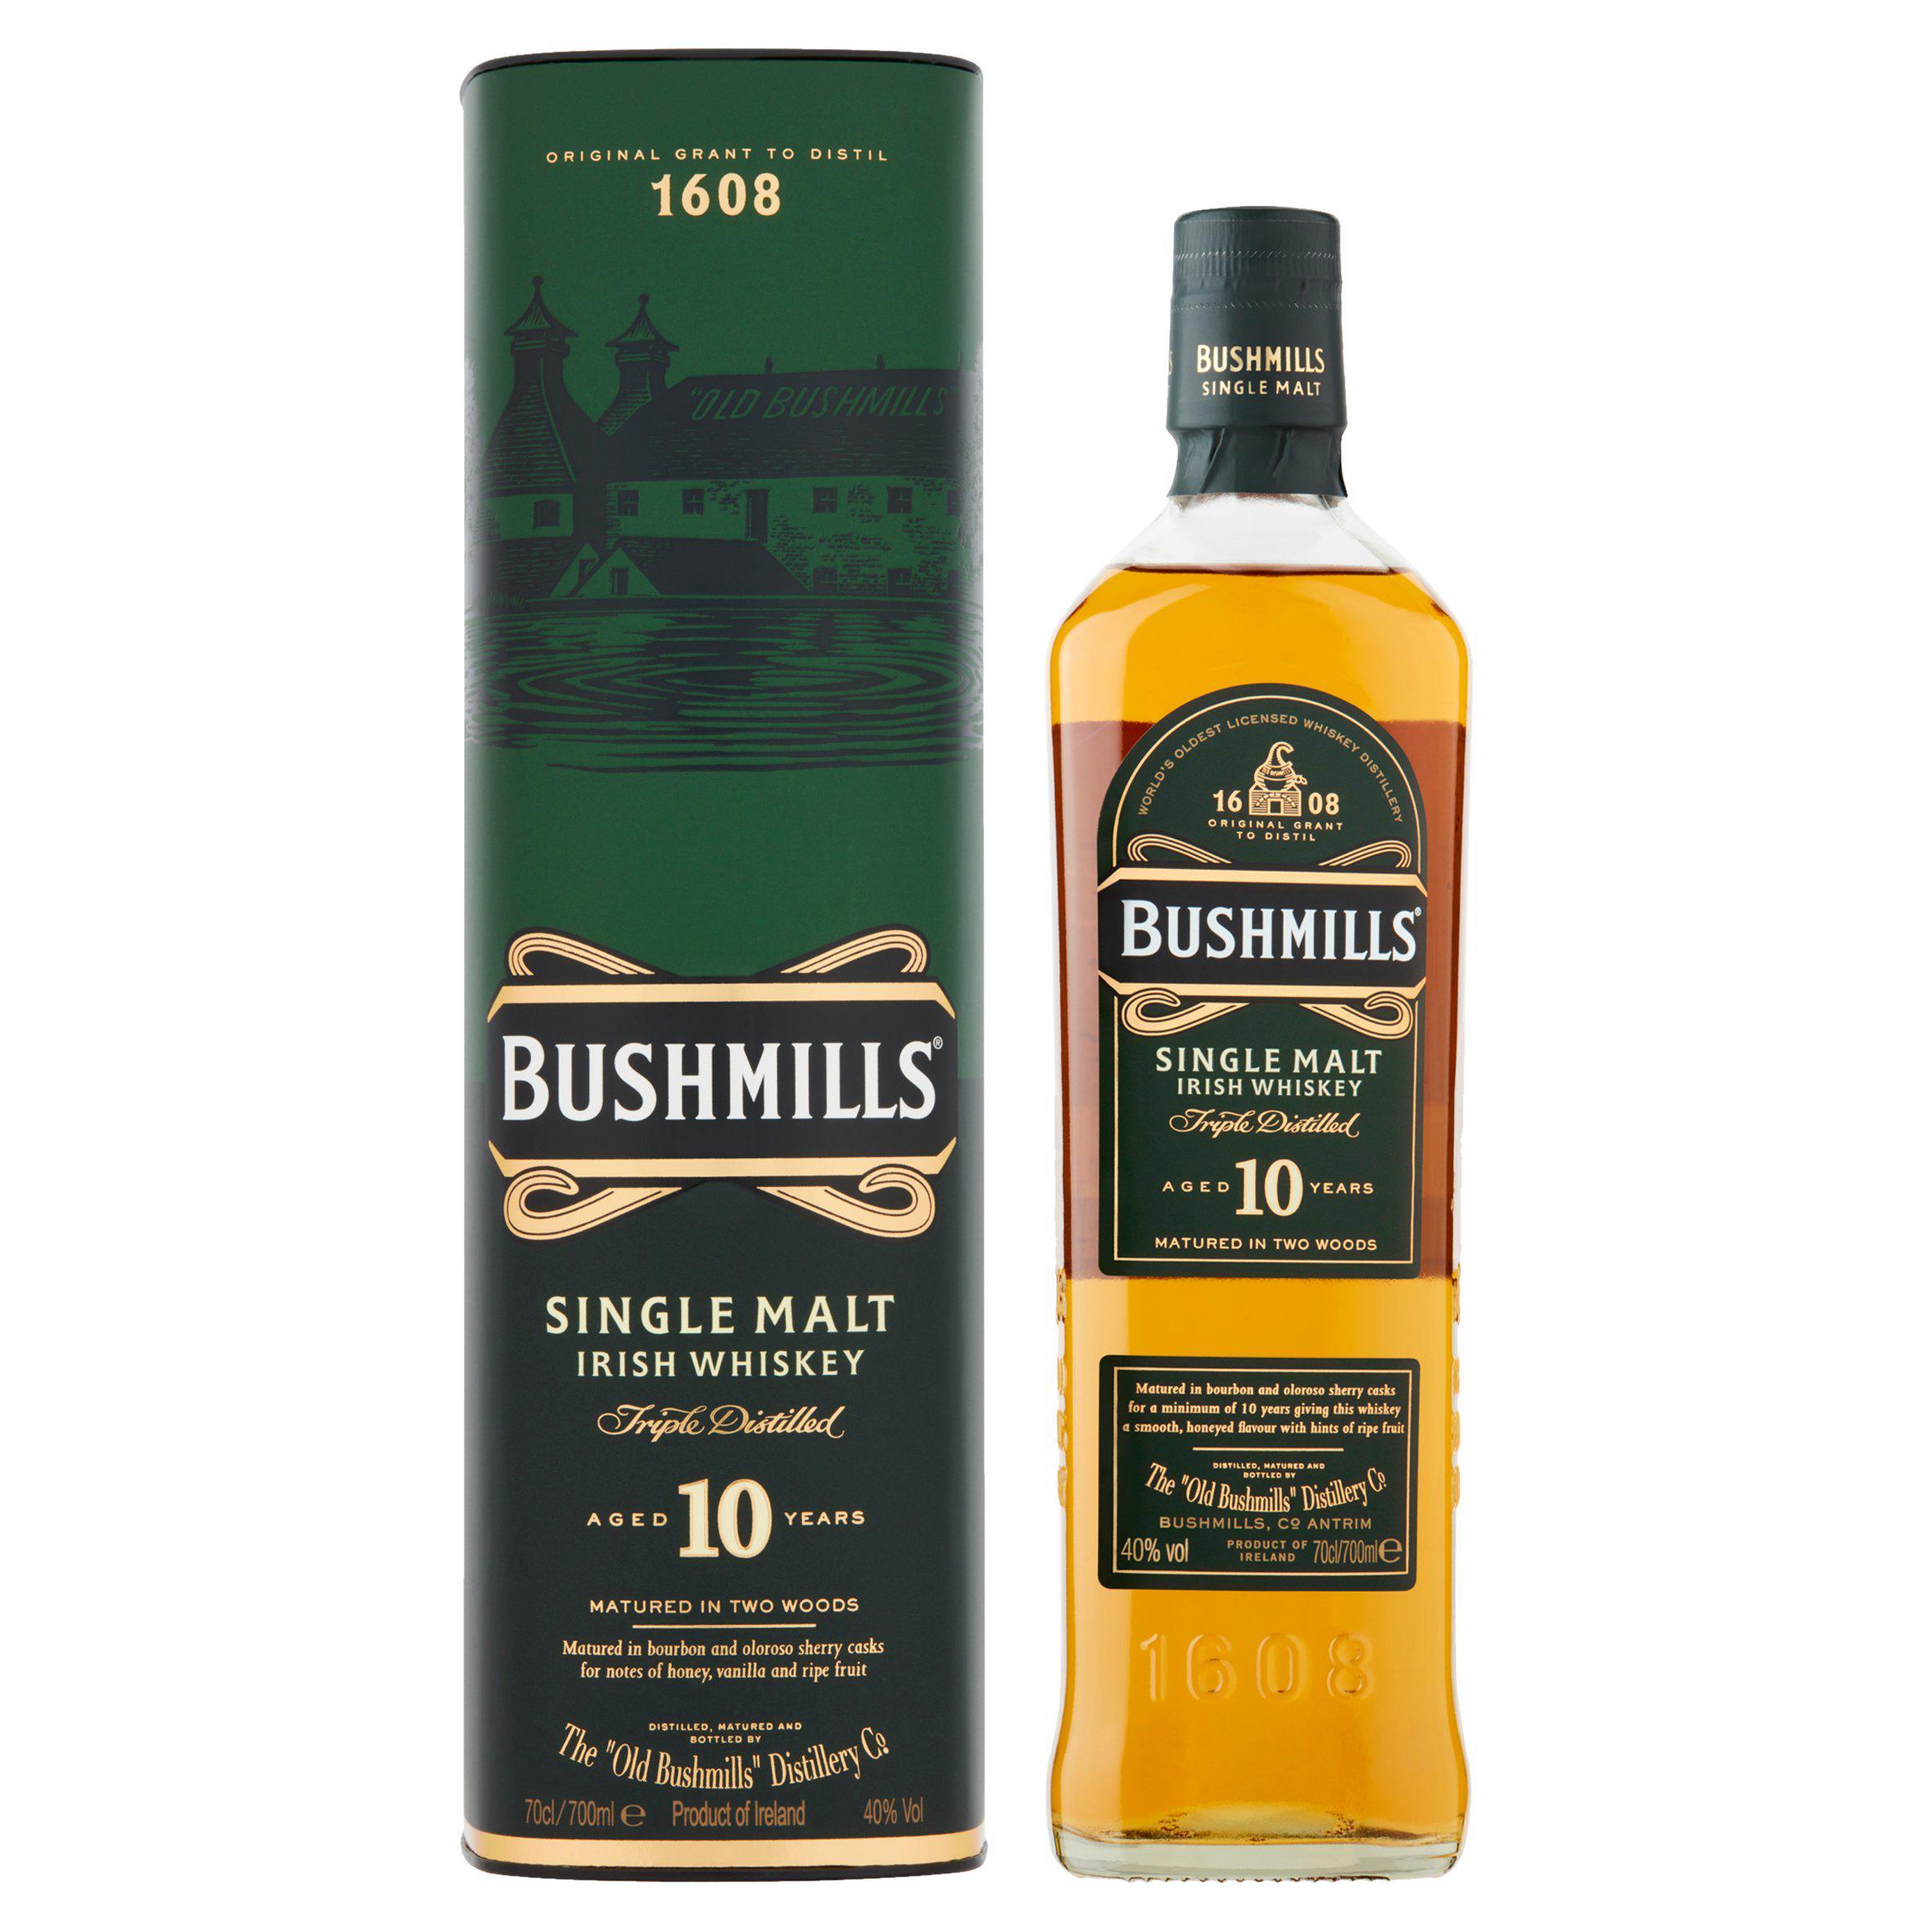 Bushmills 10yr Irish Malt 70ml £25 (Minimum Basket / Delivery Fees) @ Sainsbury's